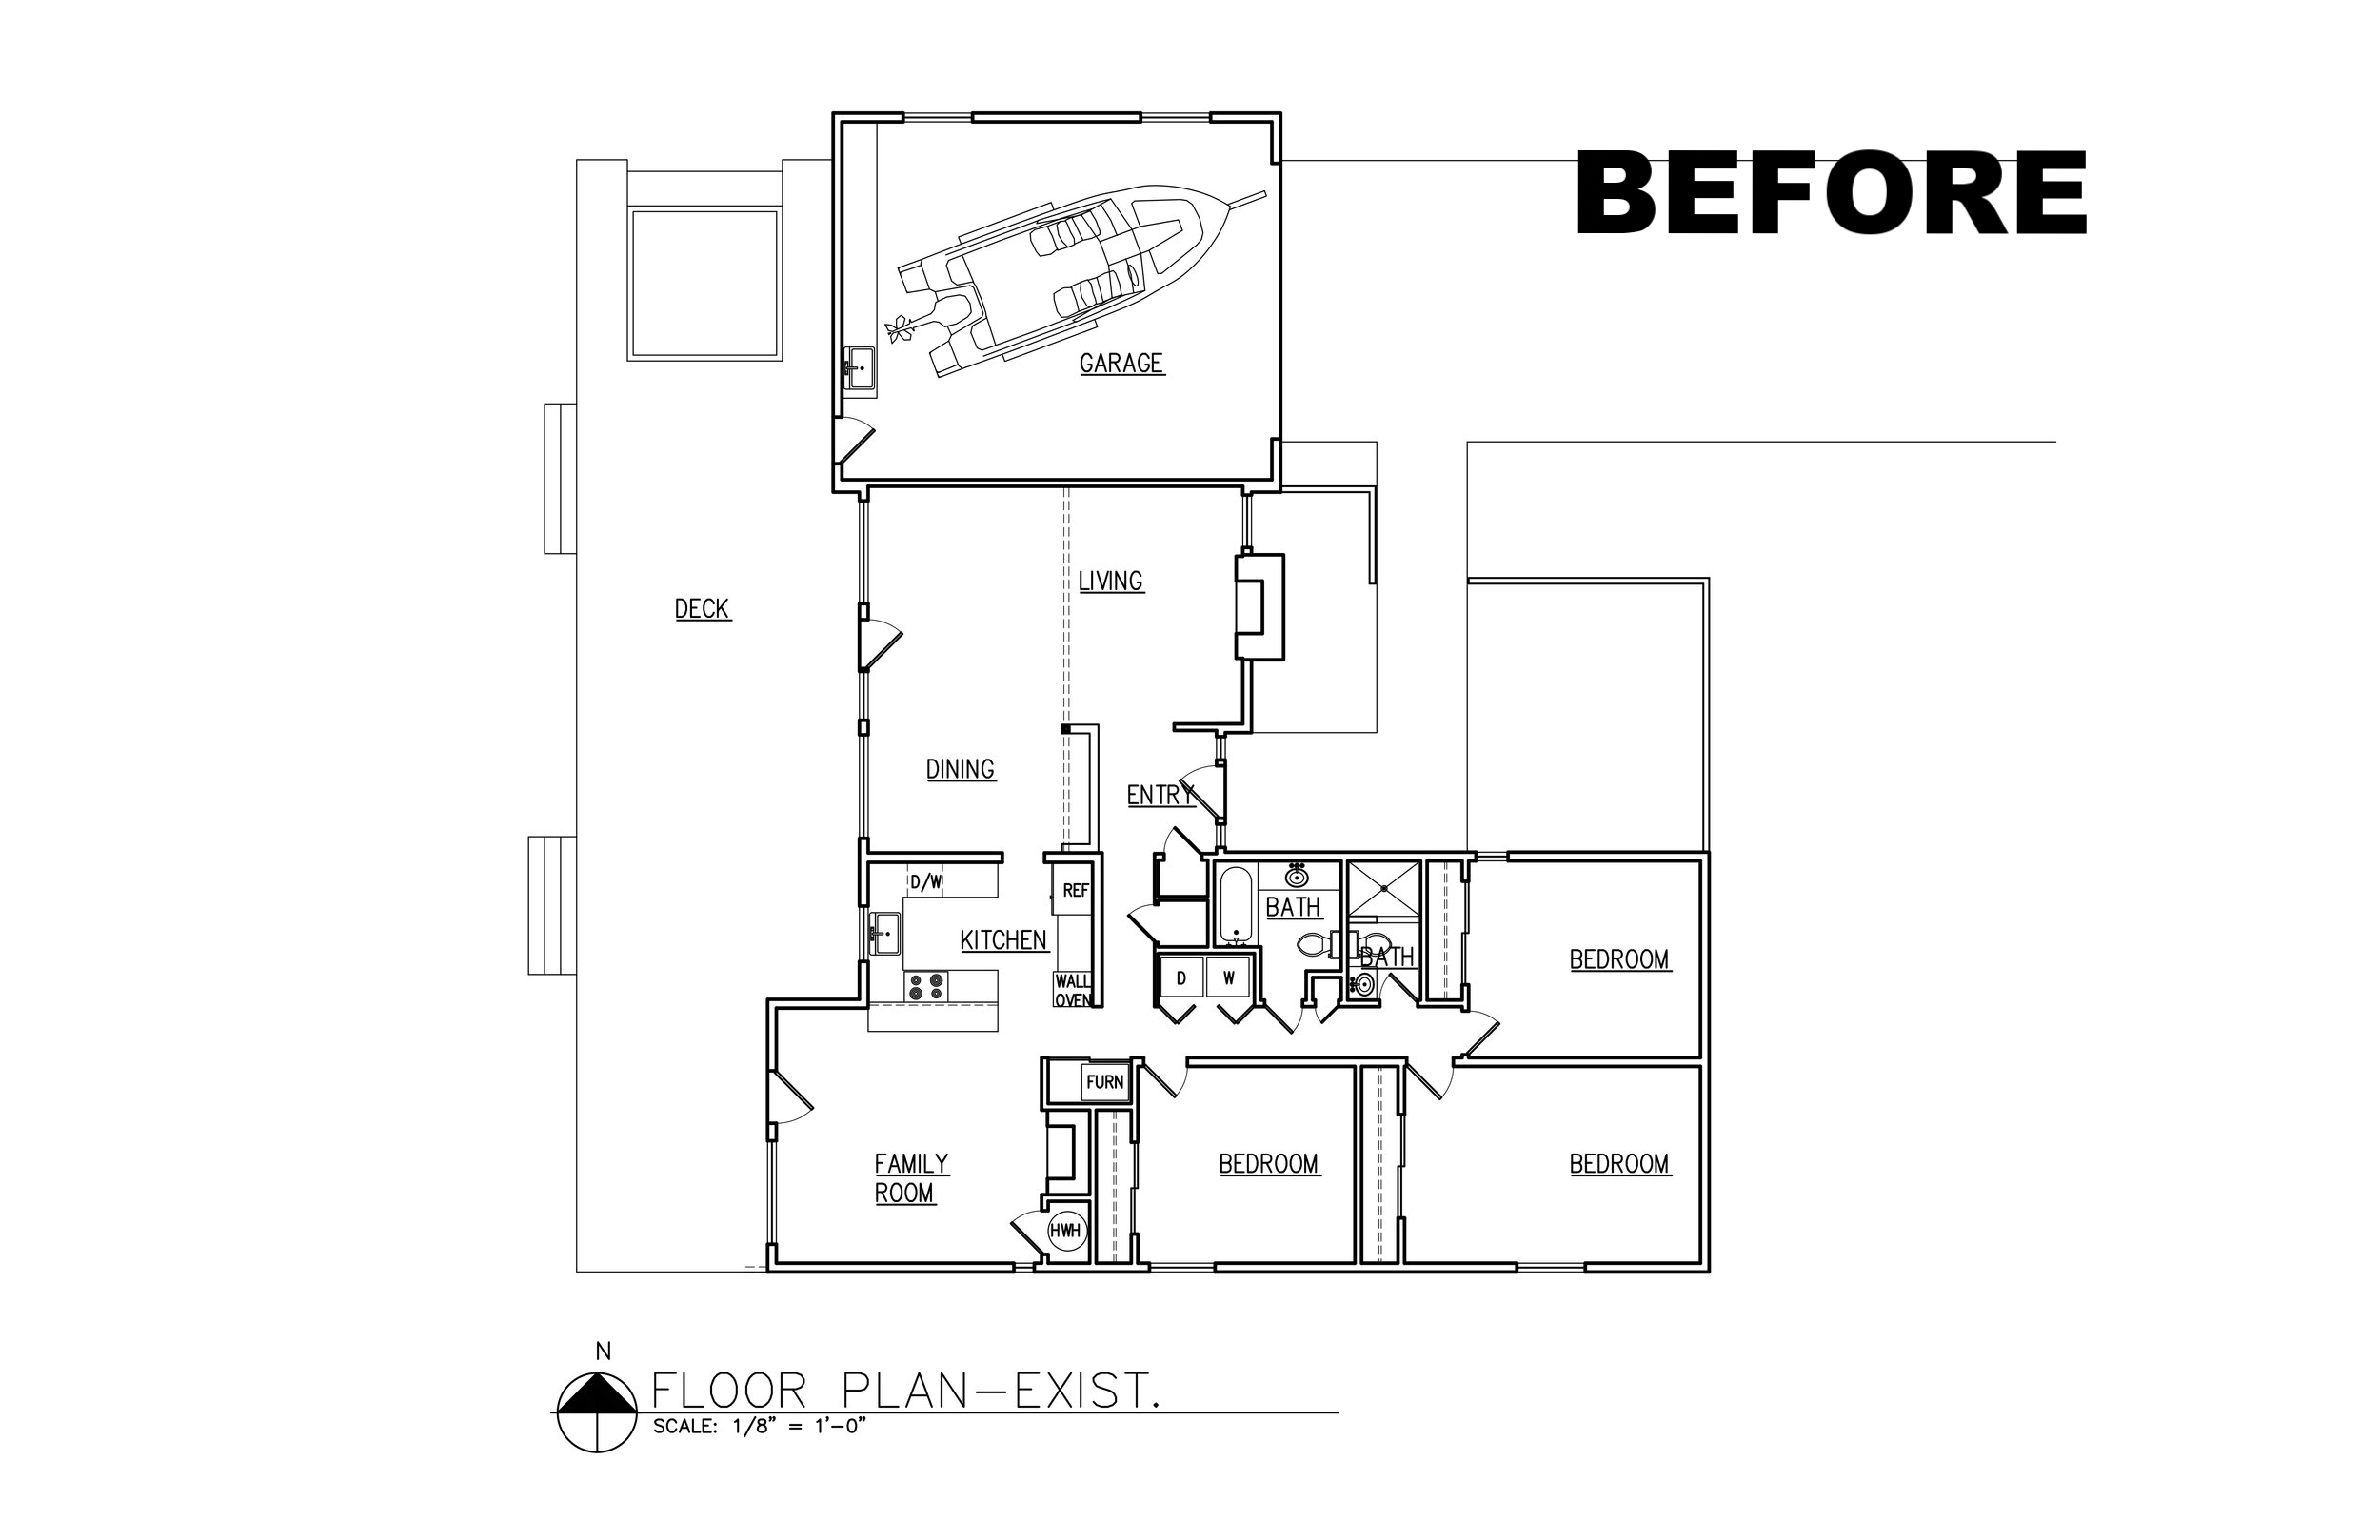 15019 Presentation plan existing.jpg